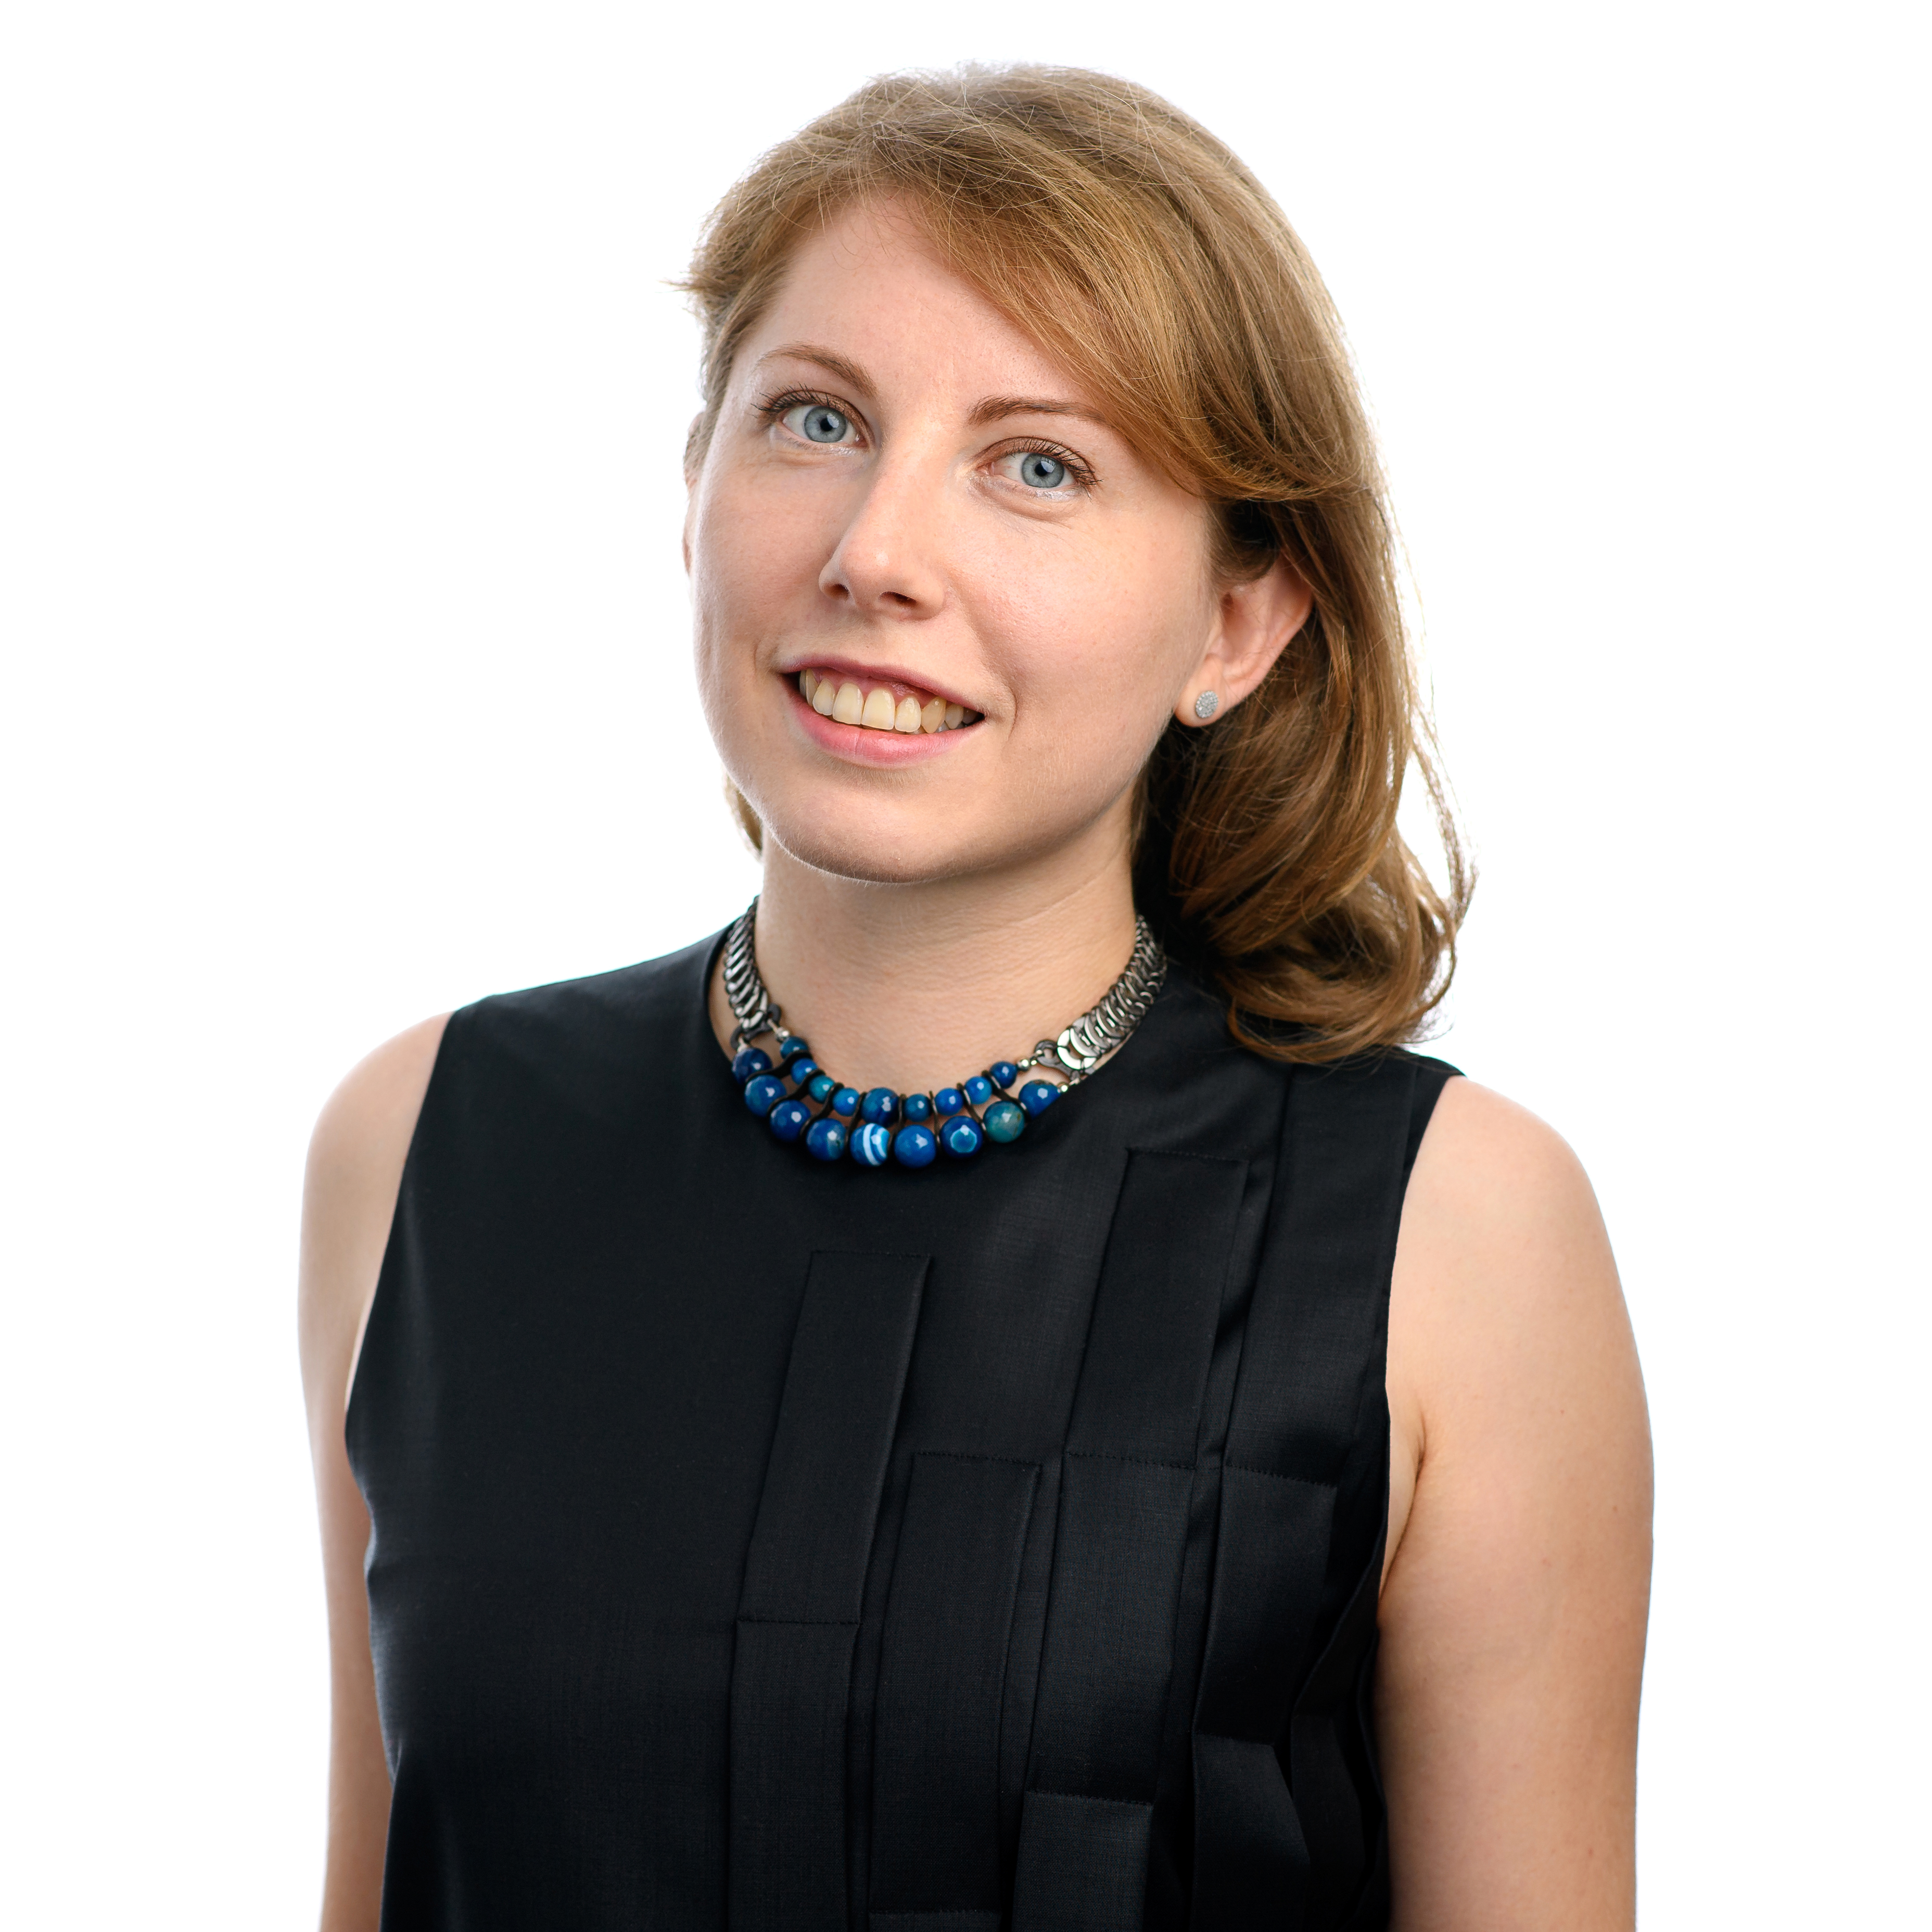 Ioana Frangu